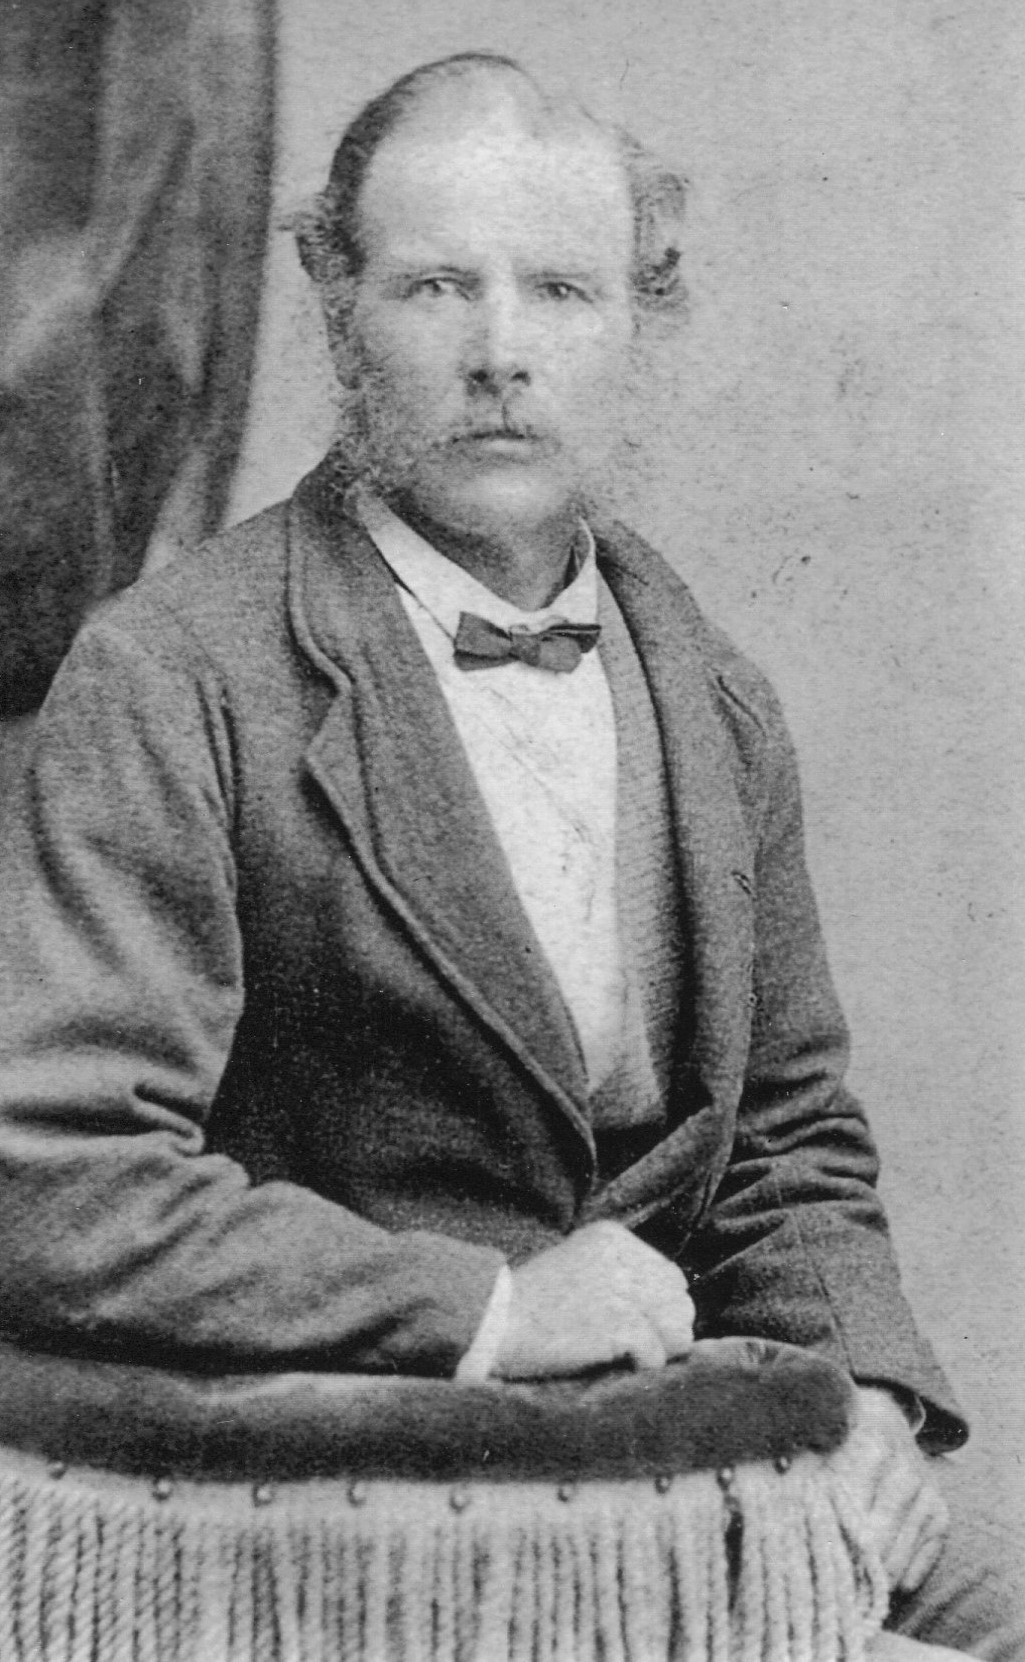 Amos Walters